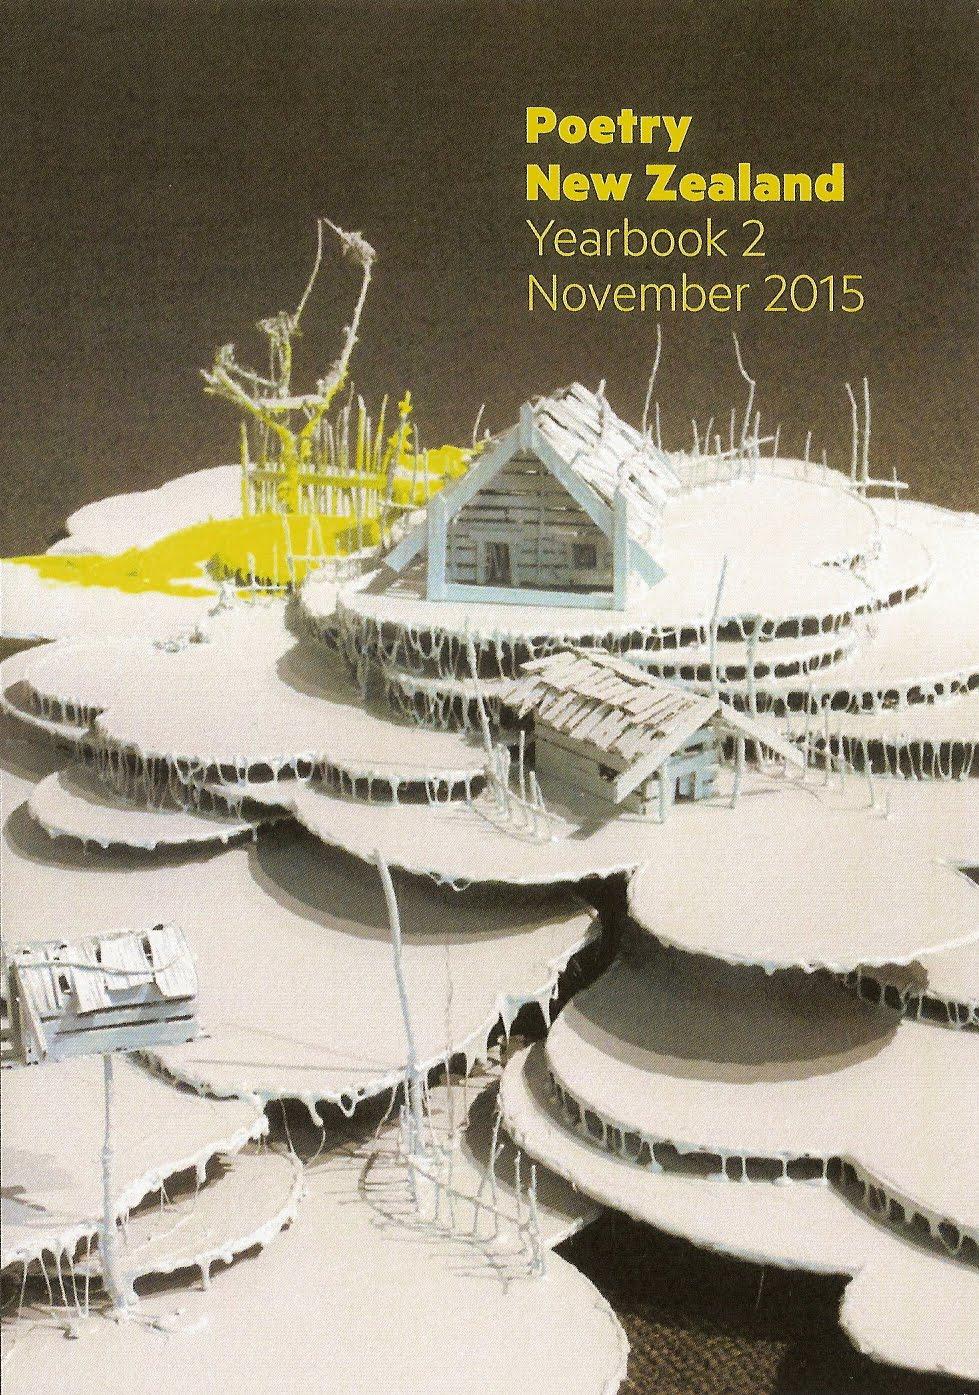 Poetry NZ Yearbook 2